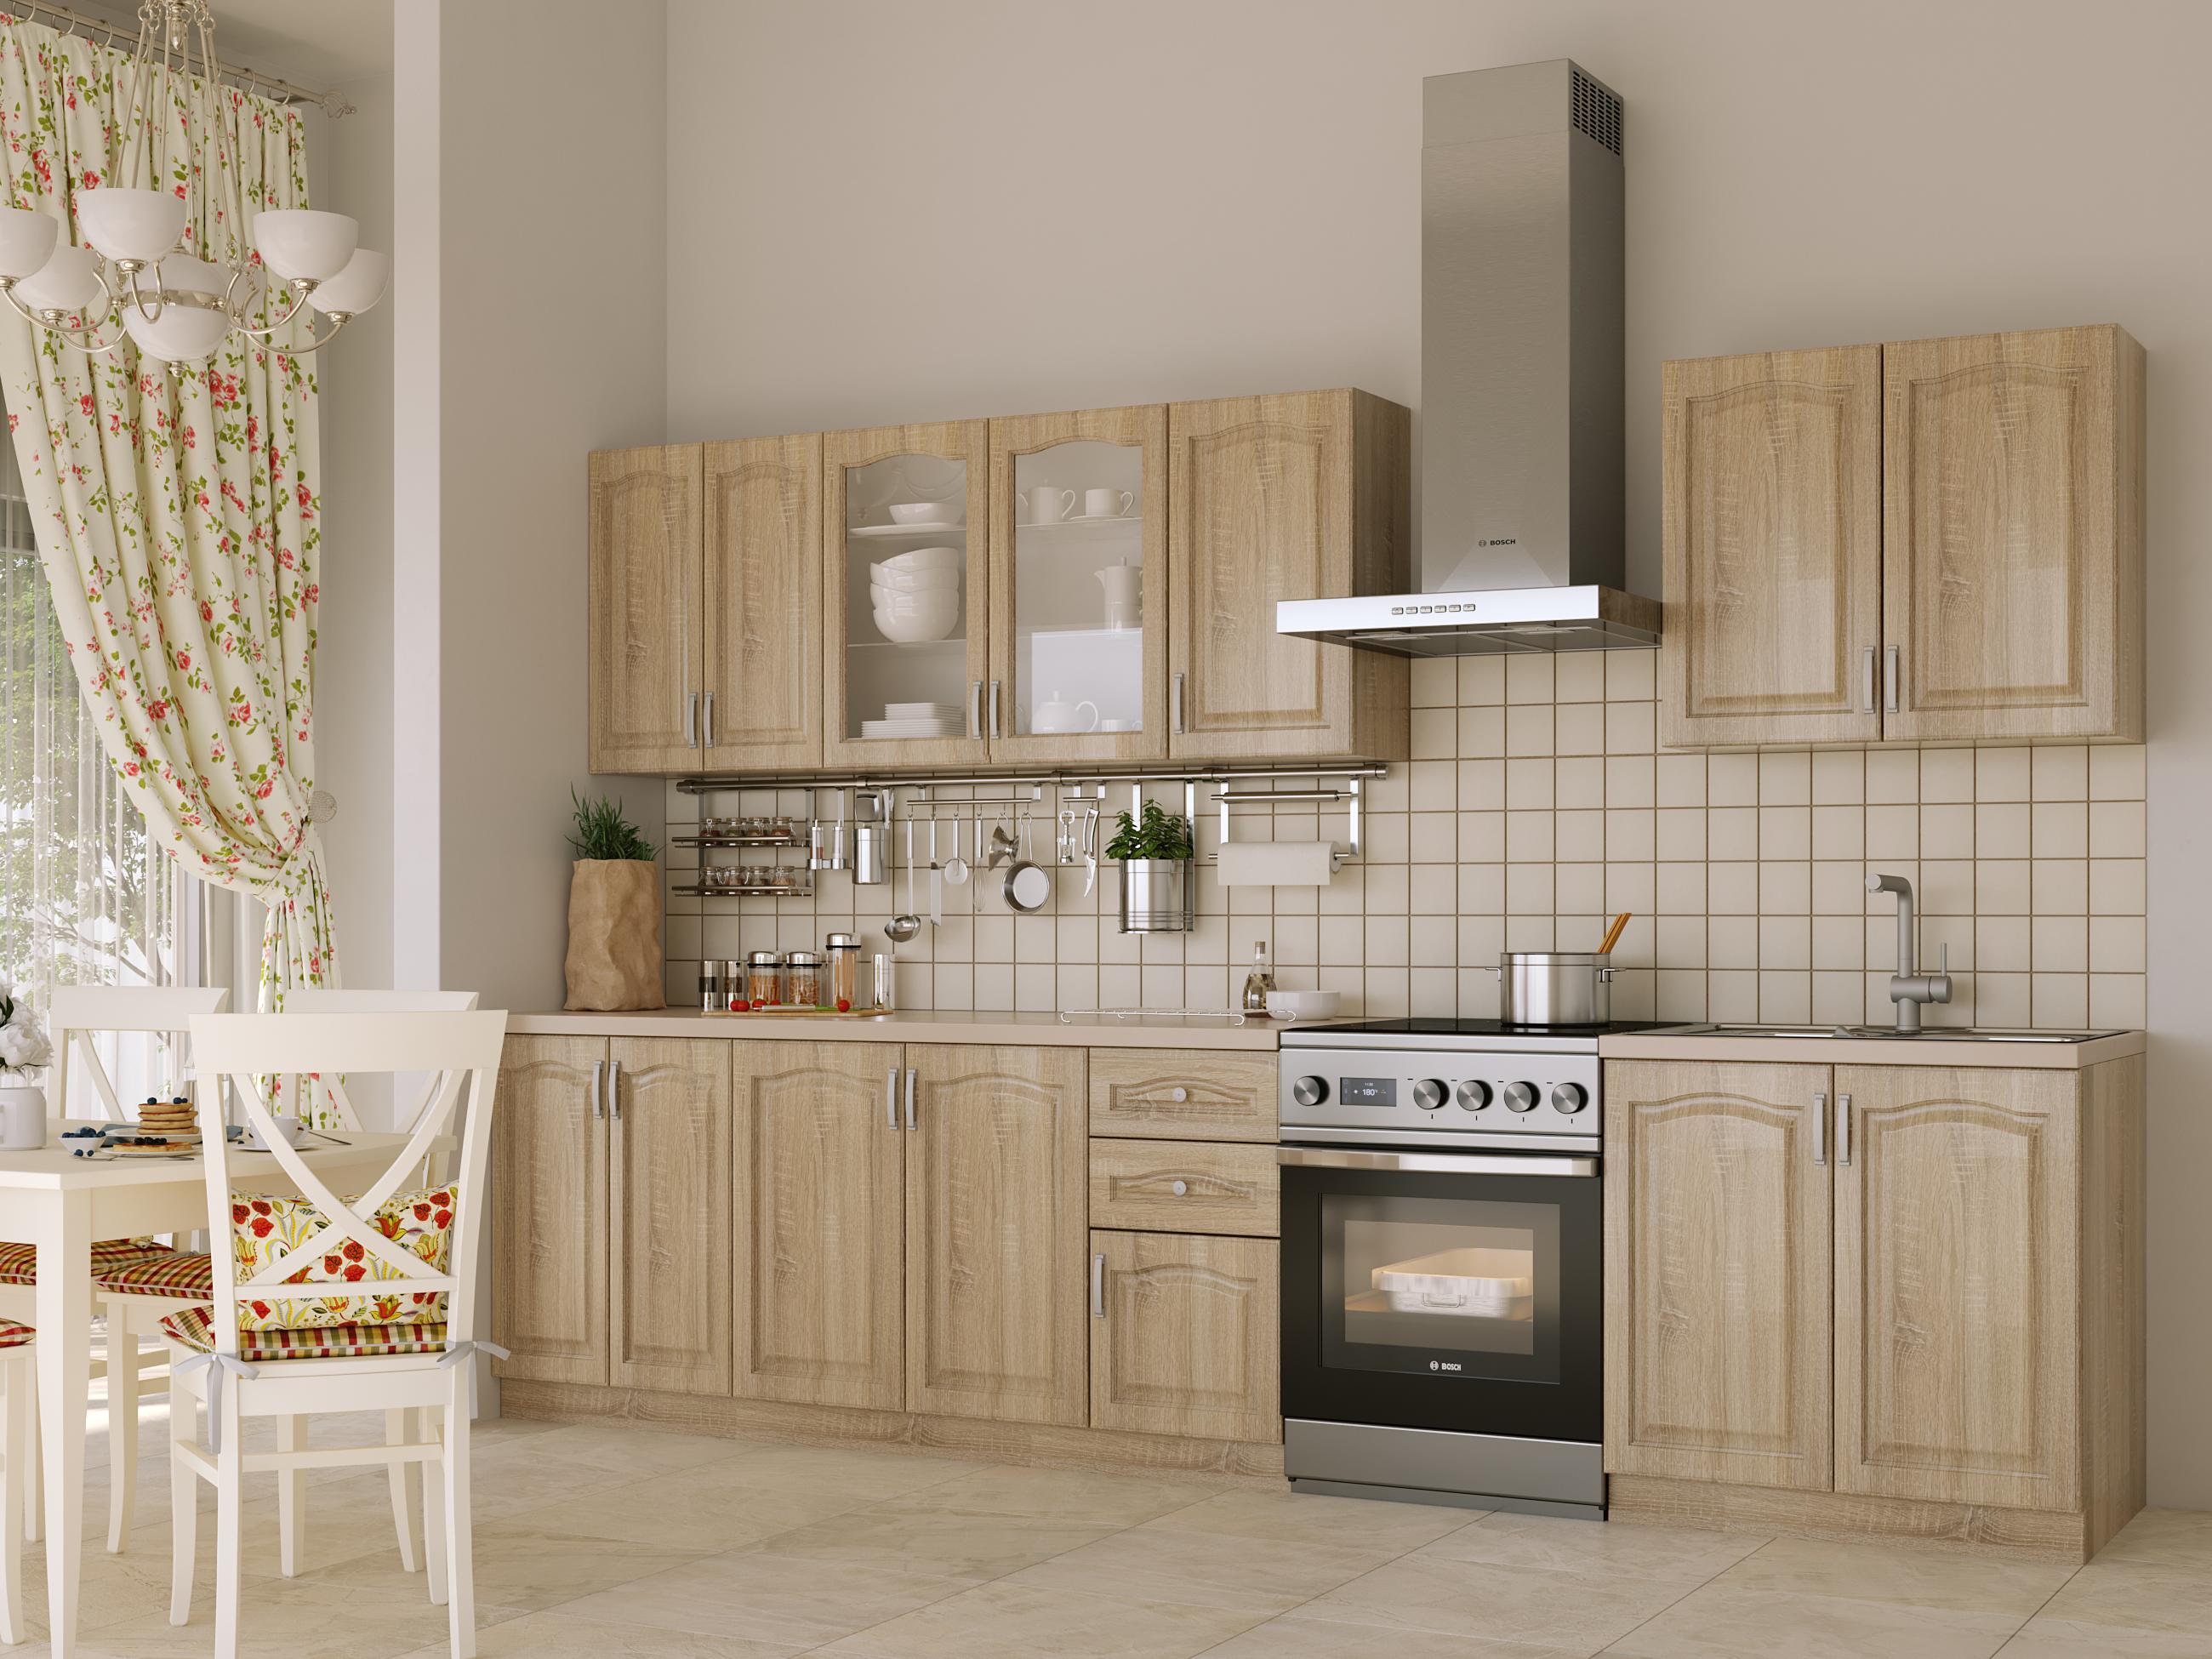 Kuchyně NIKA CLASSIC 260 cm, dub sonoma